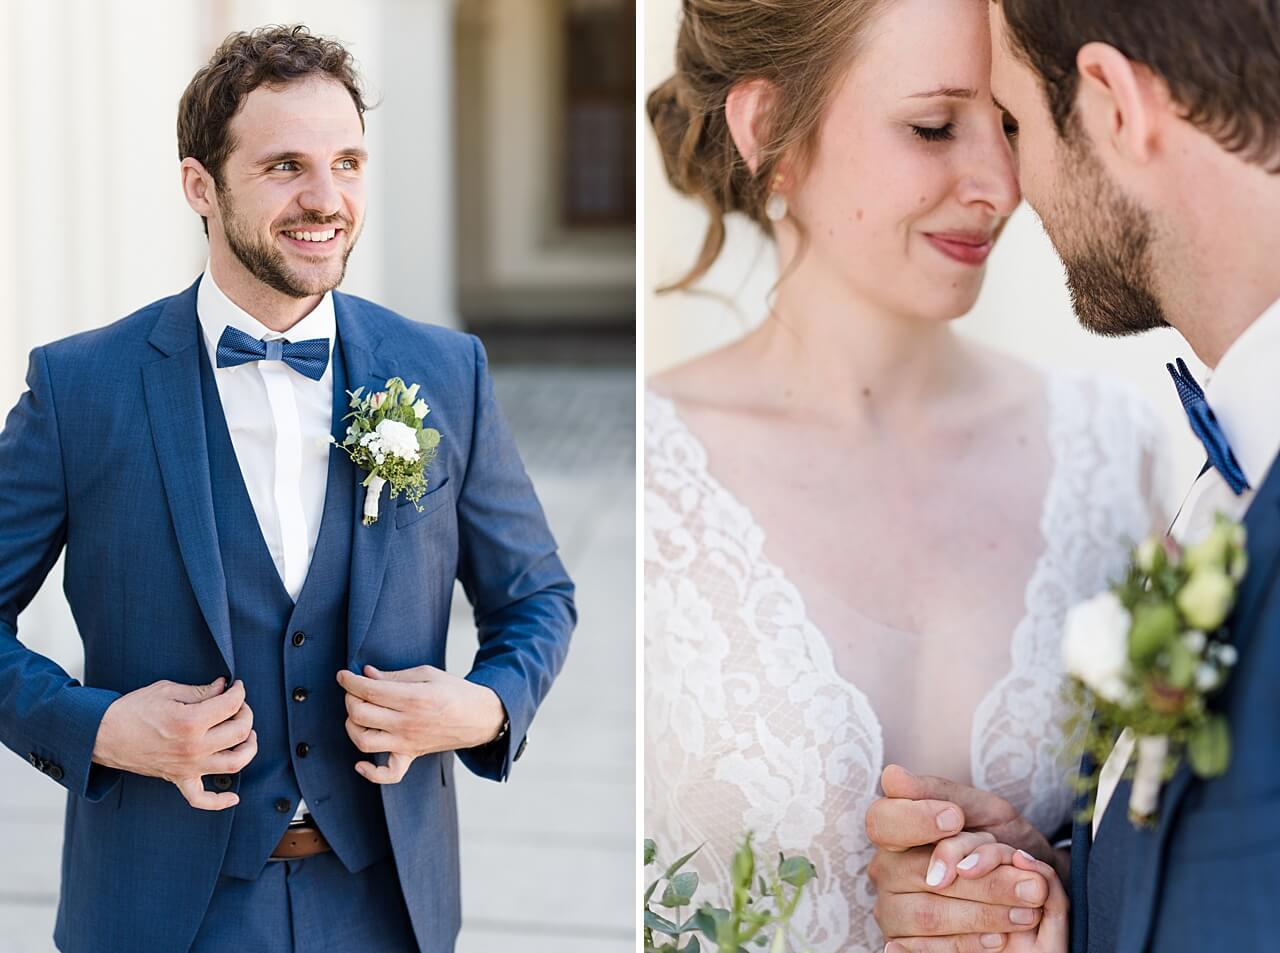 Rebecca Conte Fotografie: Romantische Hochzeitsfotos 08